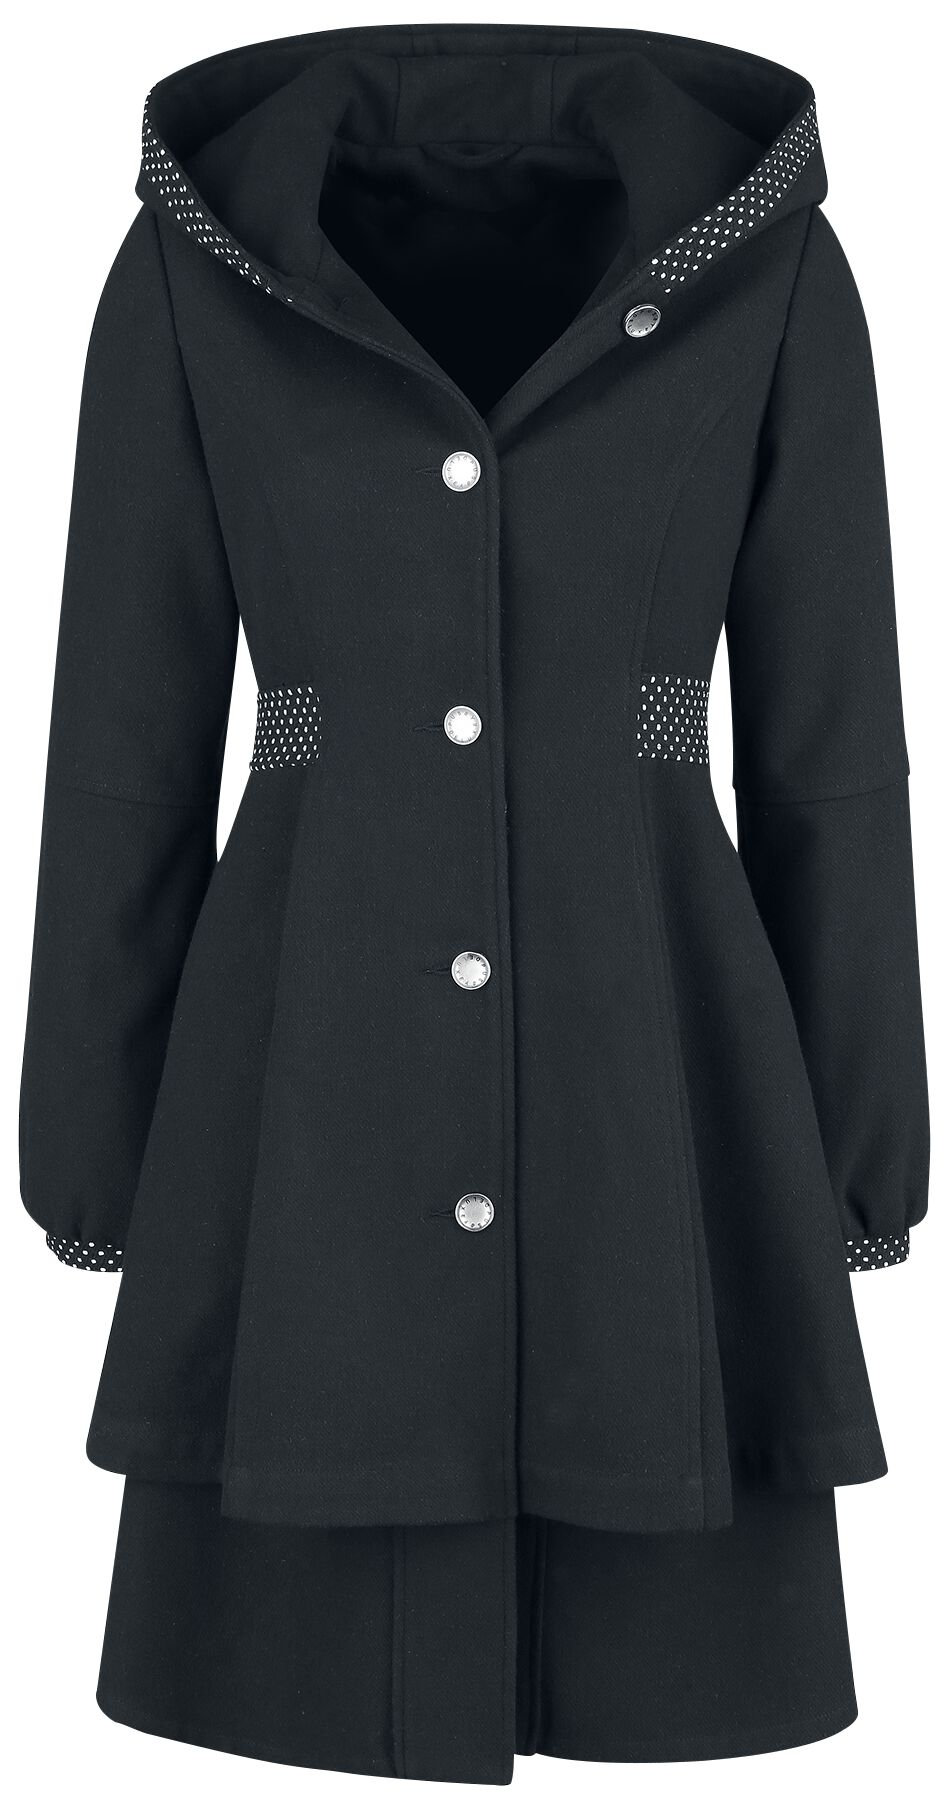 Image of   Pussy Deluxe Pretty Dotties Girl Coat Girlie frakke sort